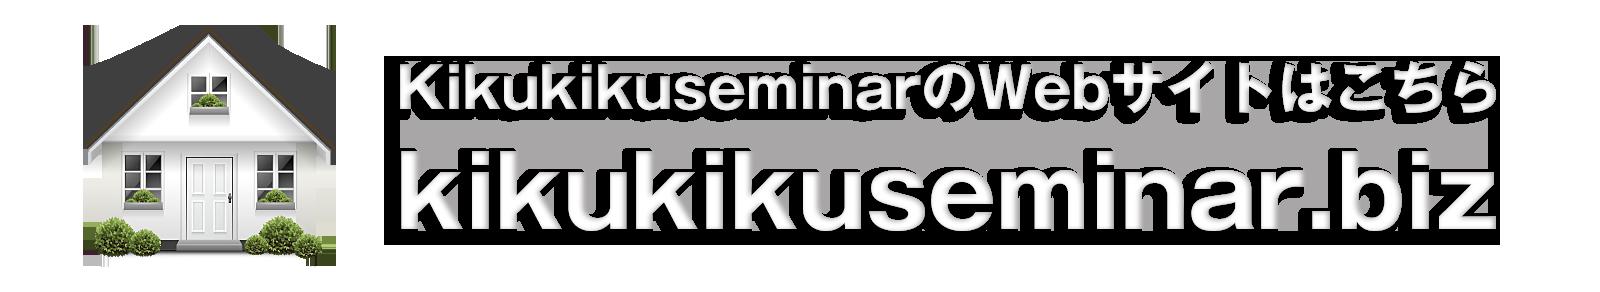 KIKUKIKUセミナーのWebサイトはこちら